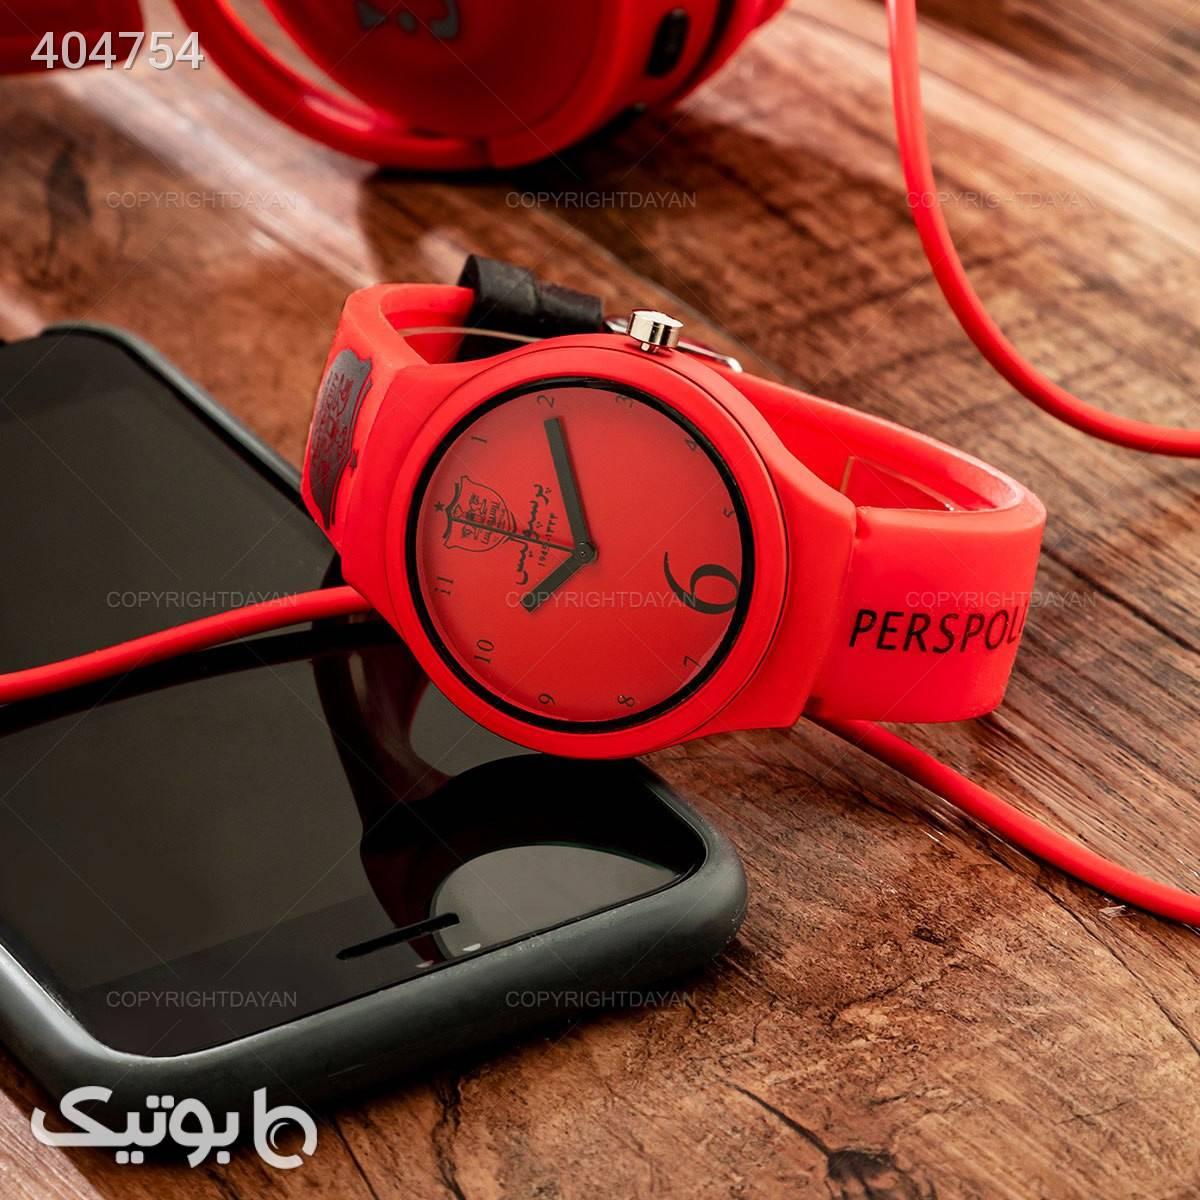 ساعت مچی پرسپولیس قرمز ساعت